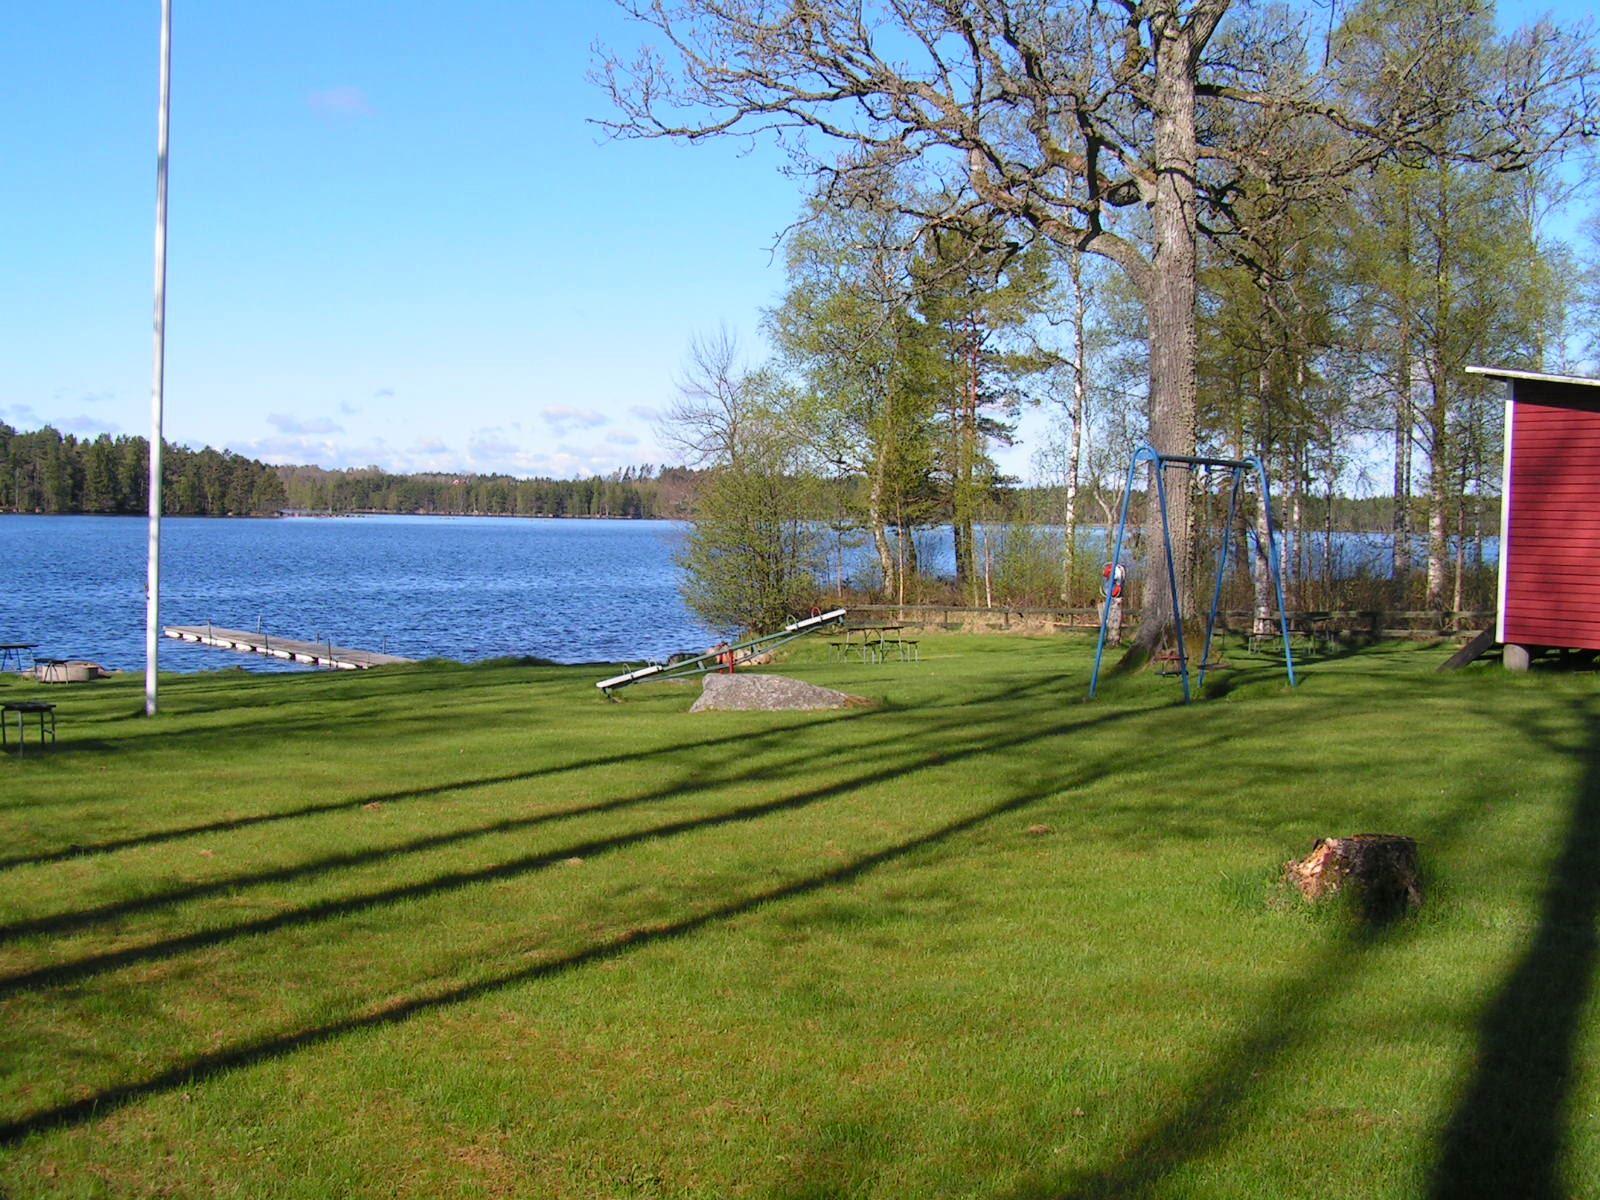 Gislaveds kommun, Bild på Stengårdshultsbadet